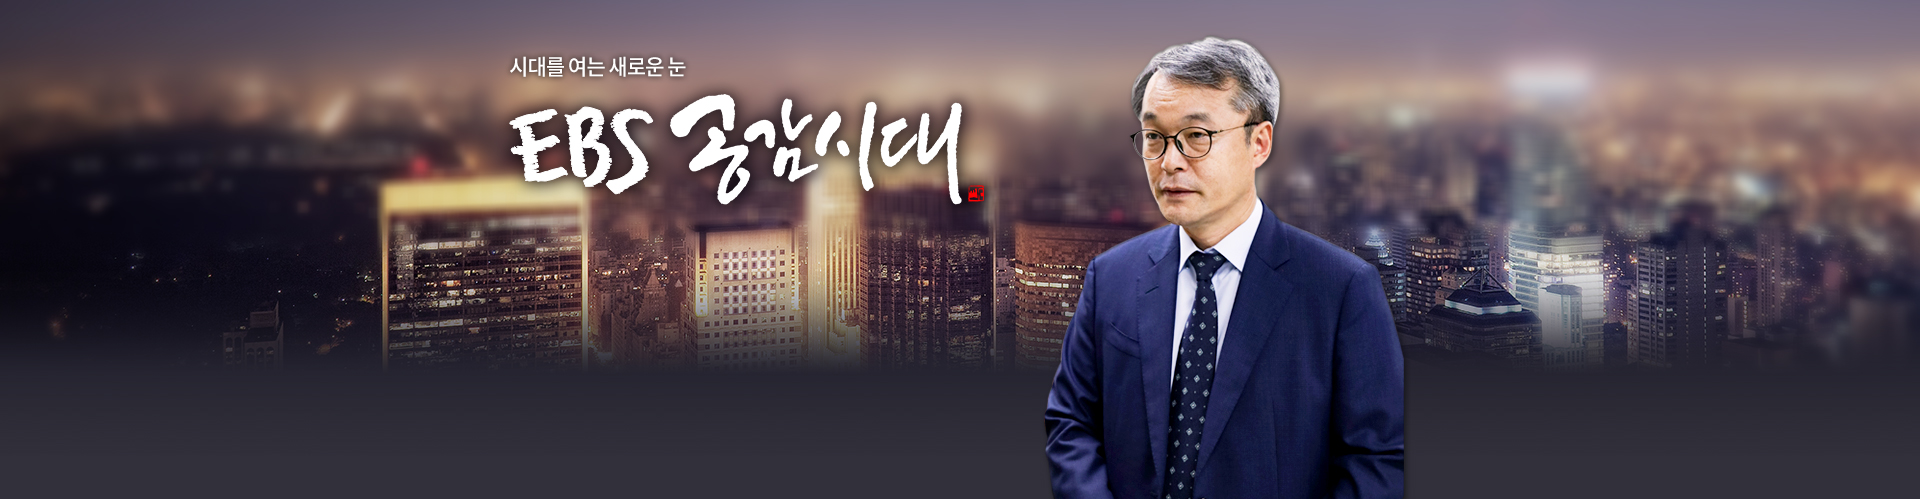 EBS 공감시대 - 0525(토) 공감시대